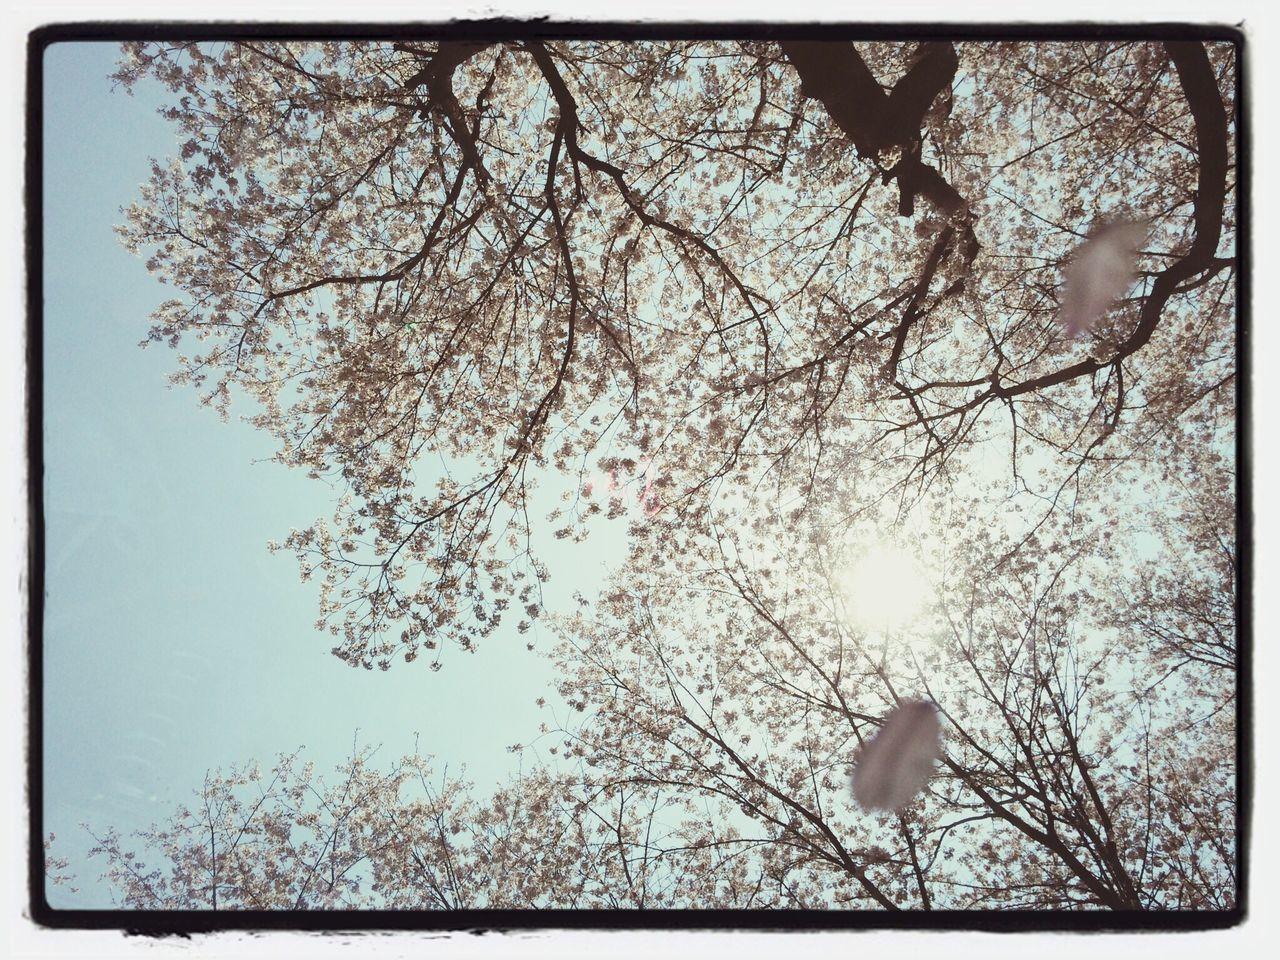 Fall...... To cover my eyes. Korea Jinju 연암도서관 Cherry Blossoms trees.